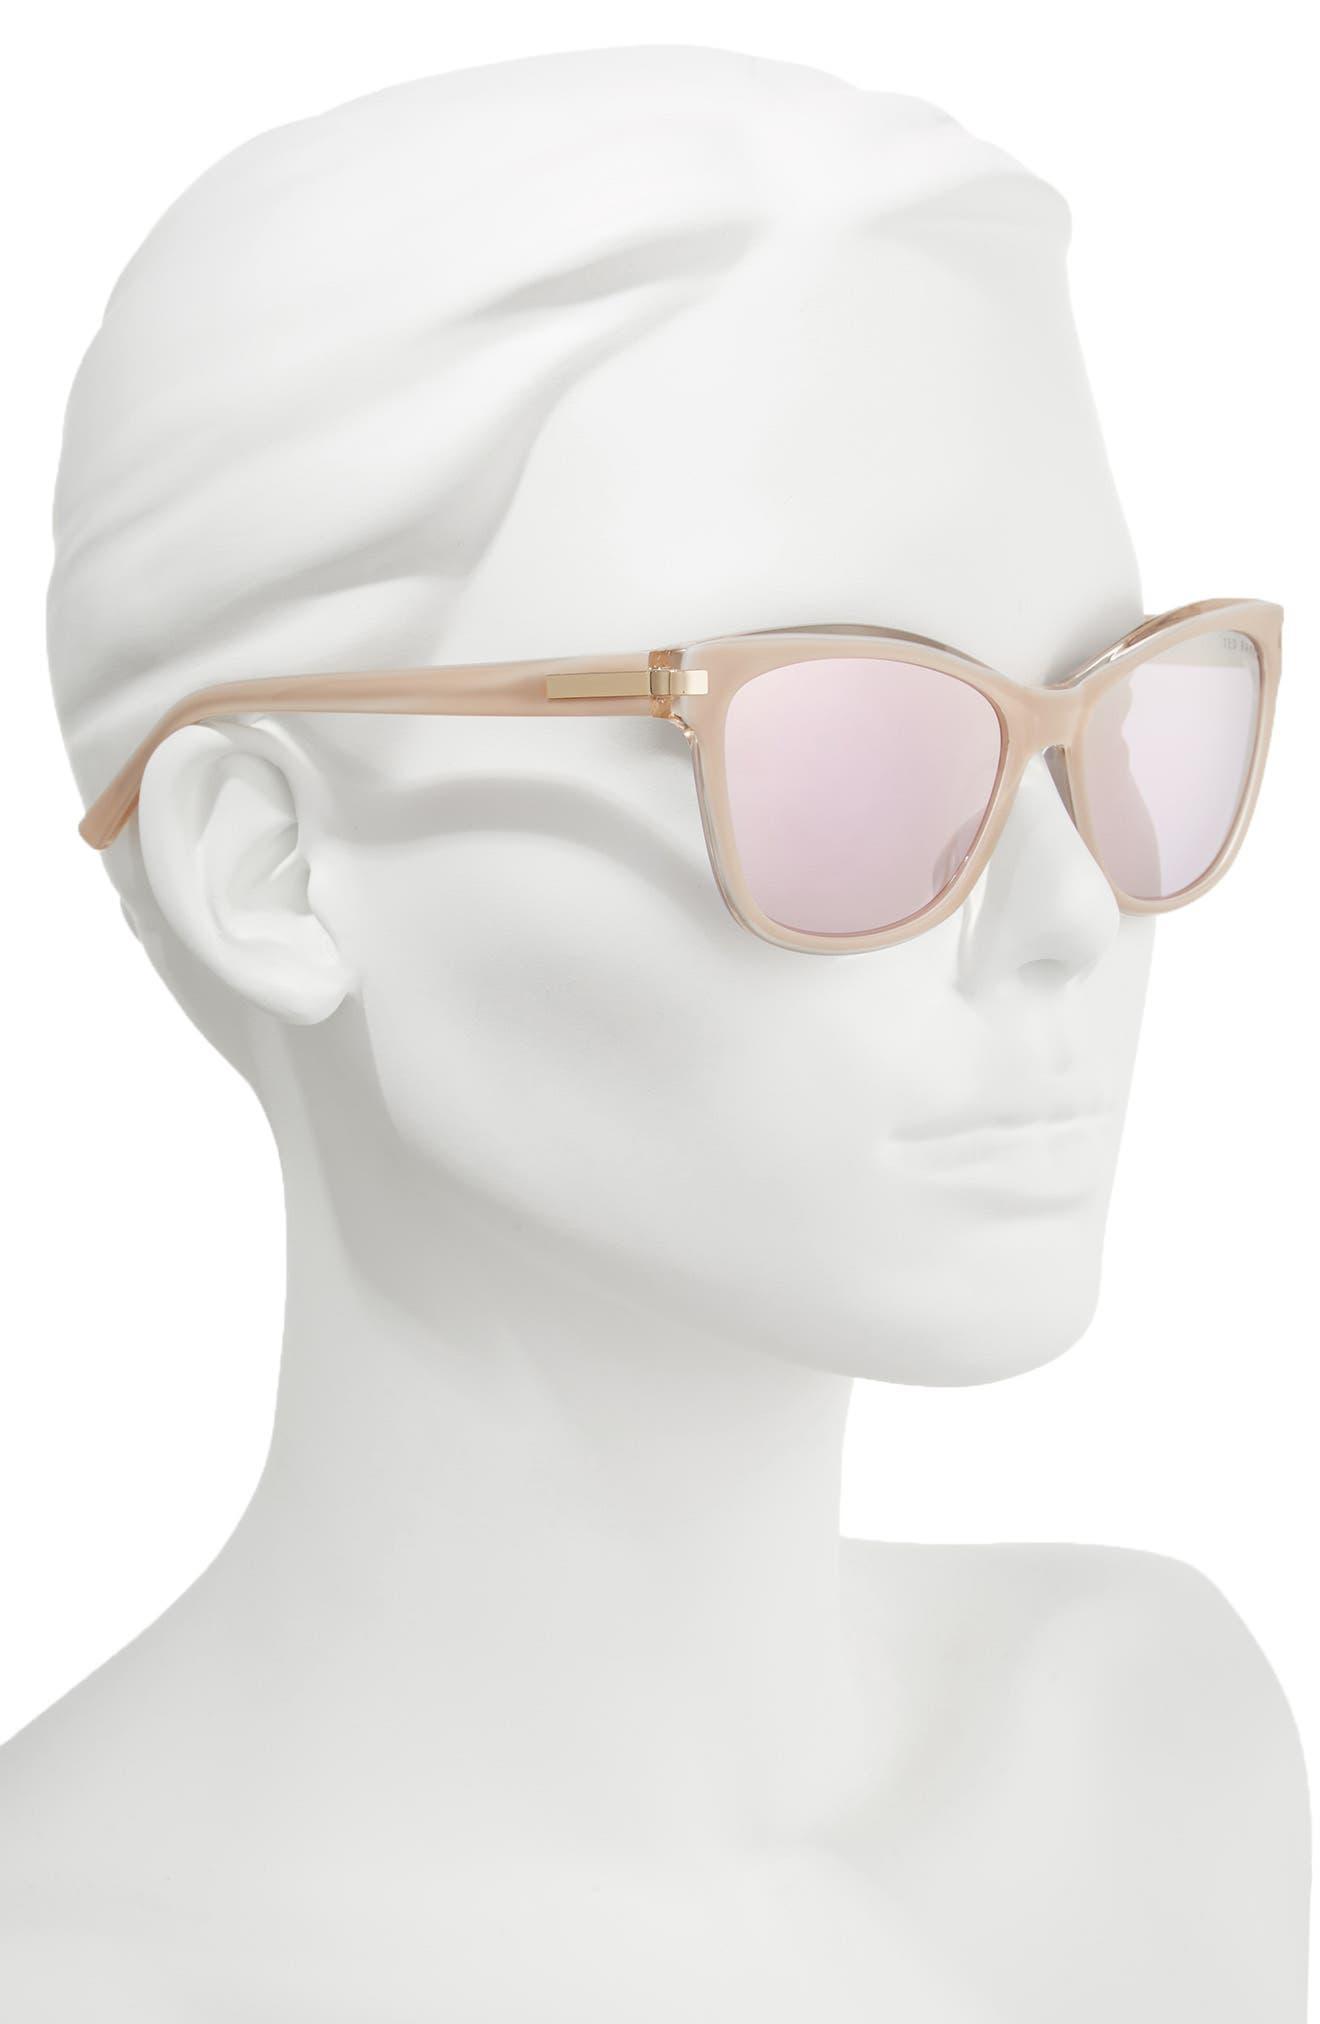 56mm Cat Eye Sunglasses,                             Alternate thumbnail 2, color,                             BLUSH